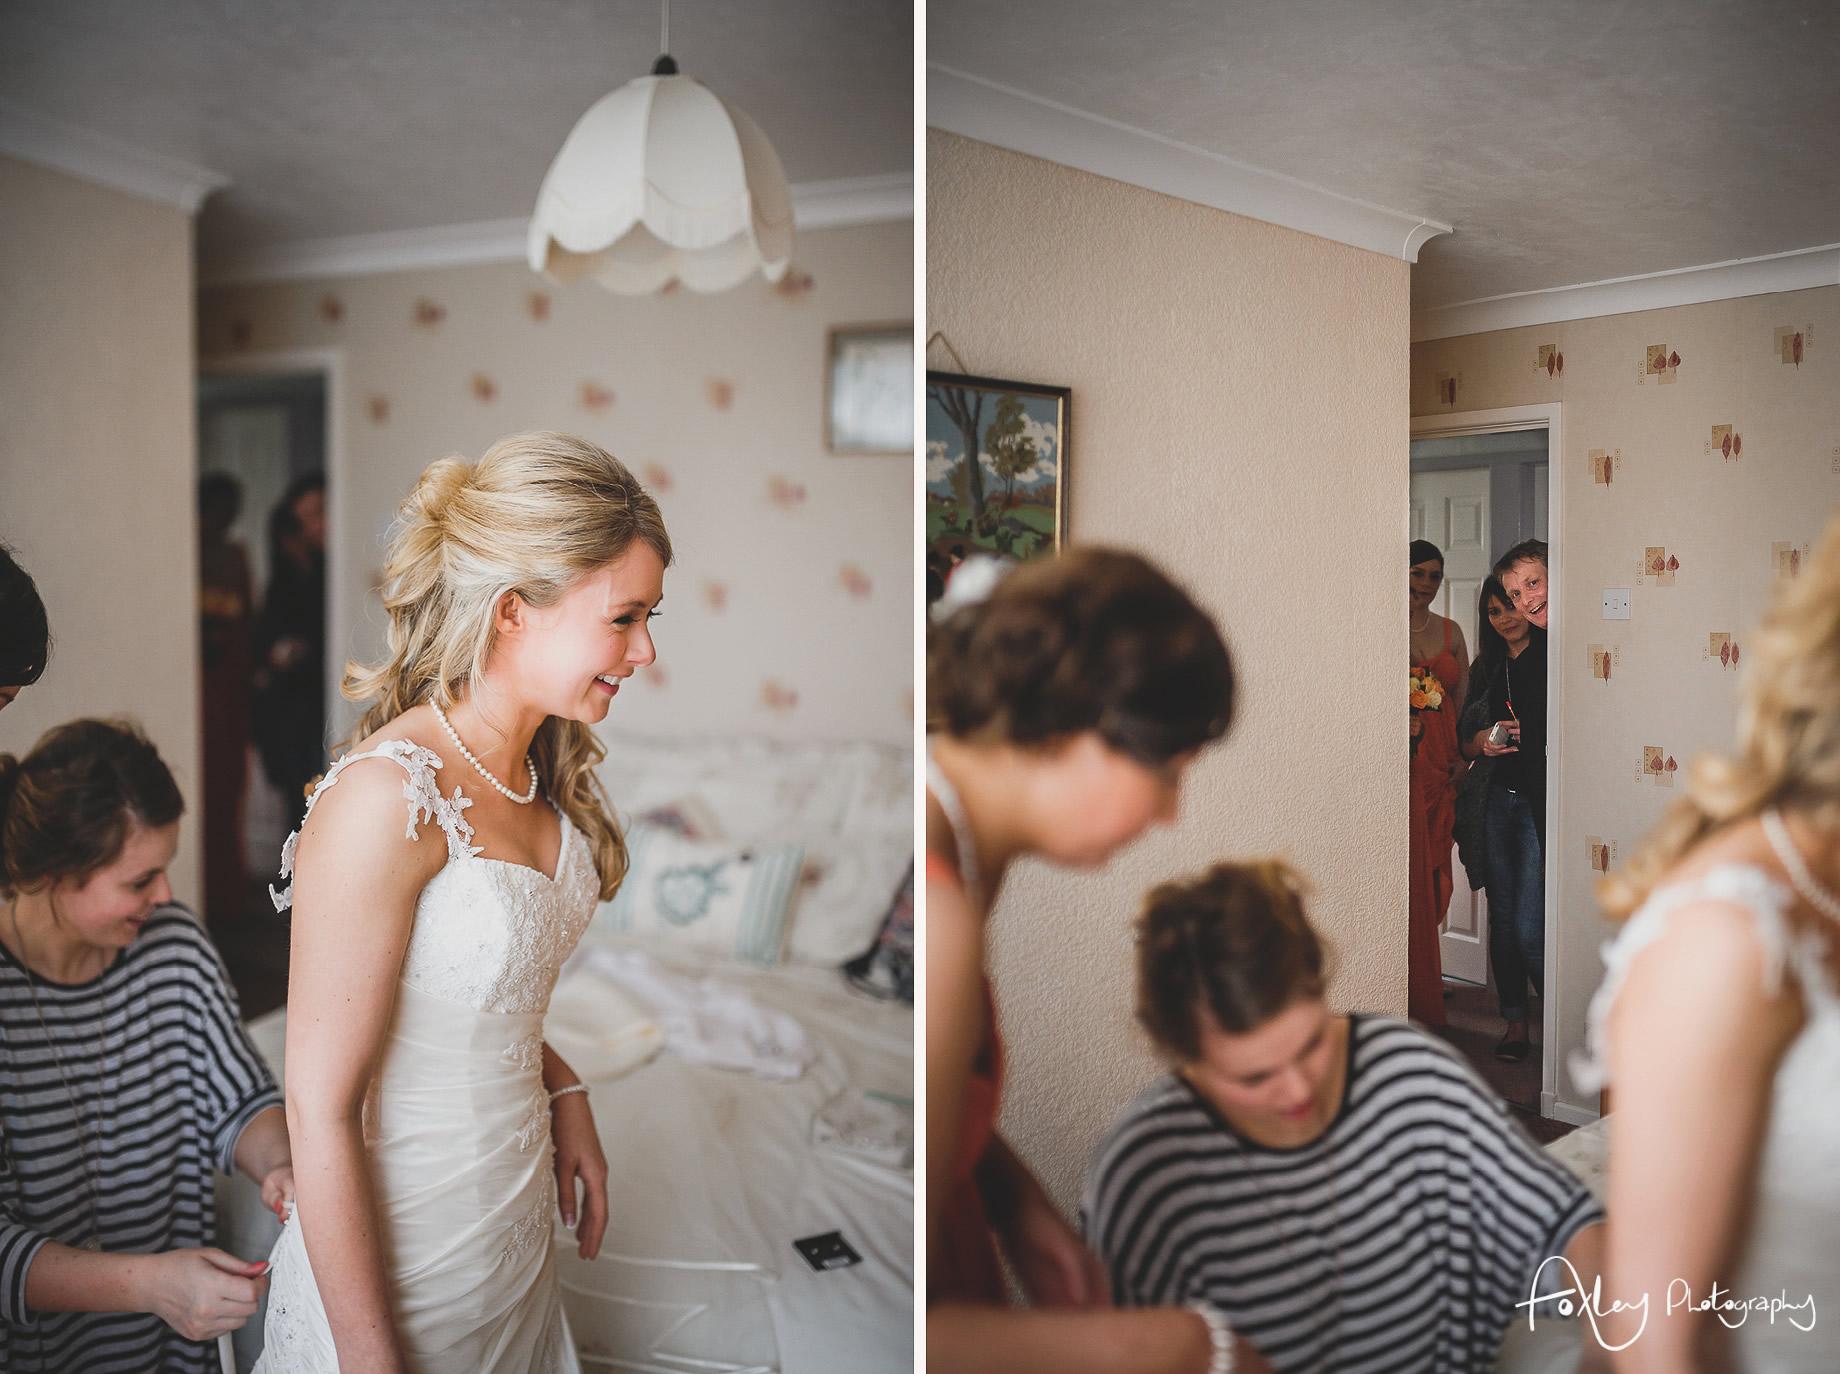 Gemma and Lewis' Wedding at Mitton Hall 043